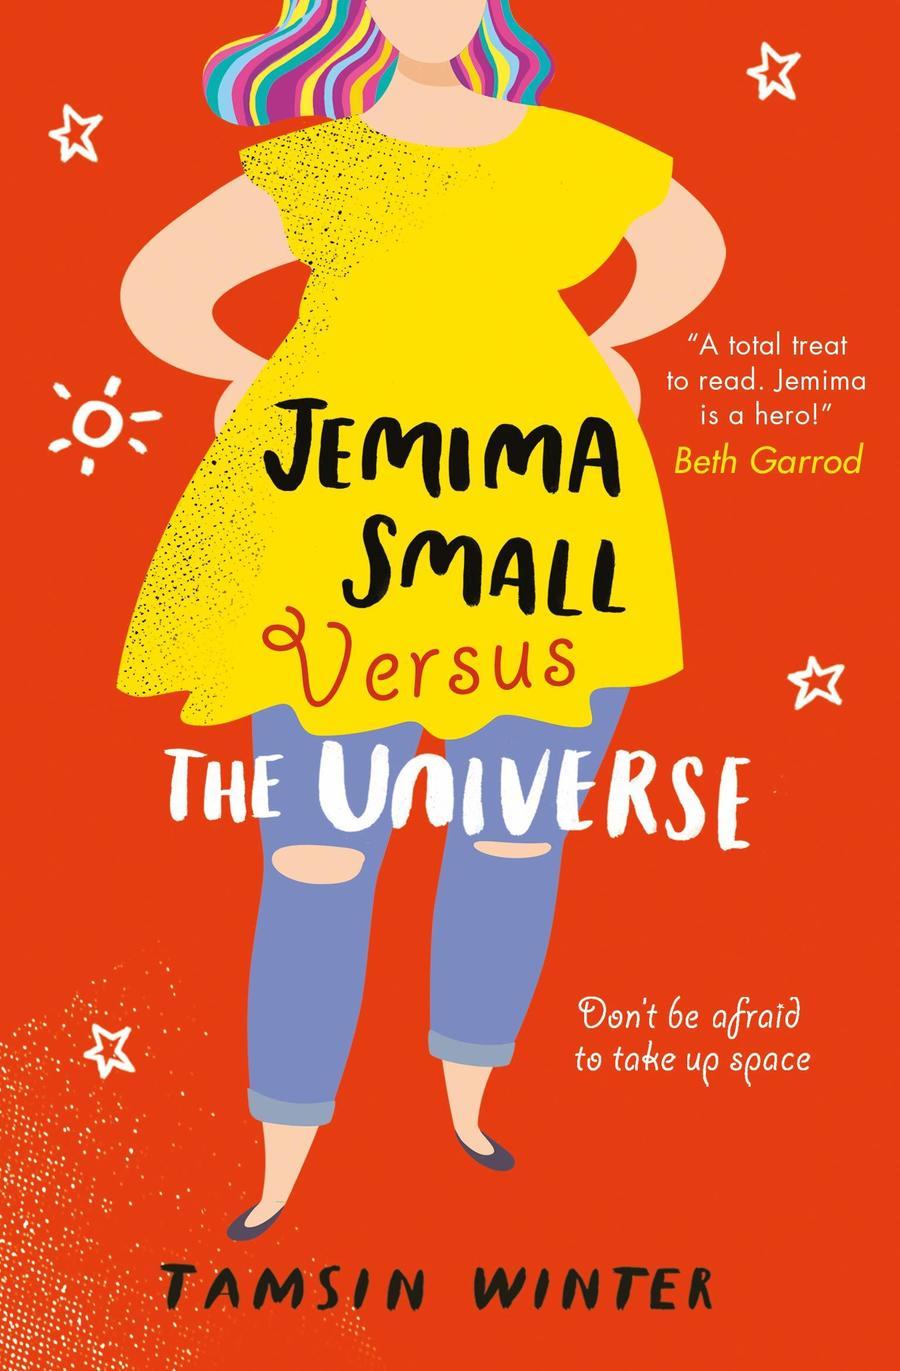 Jemima Small Versus the Universe - Tamsin Winter